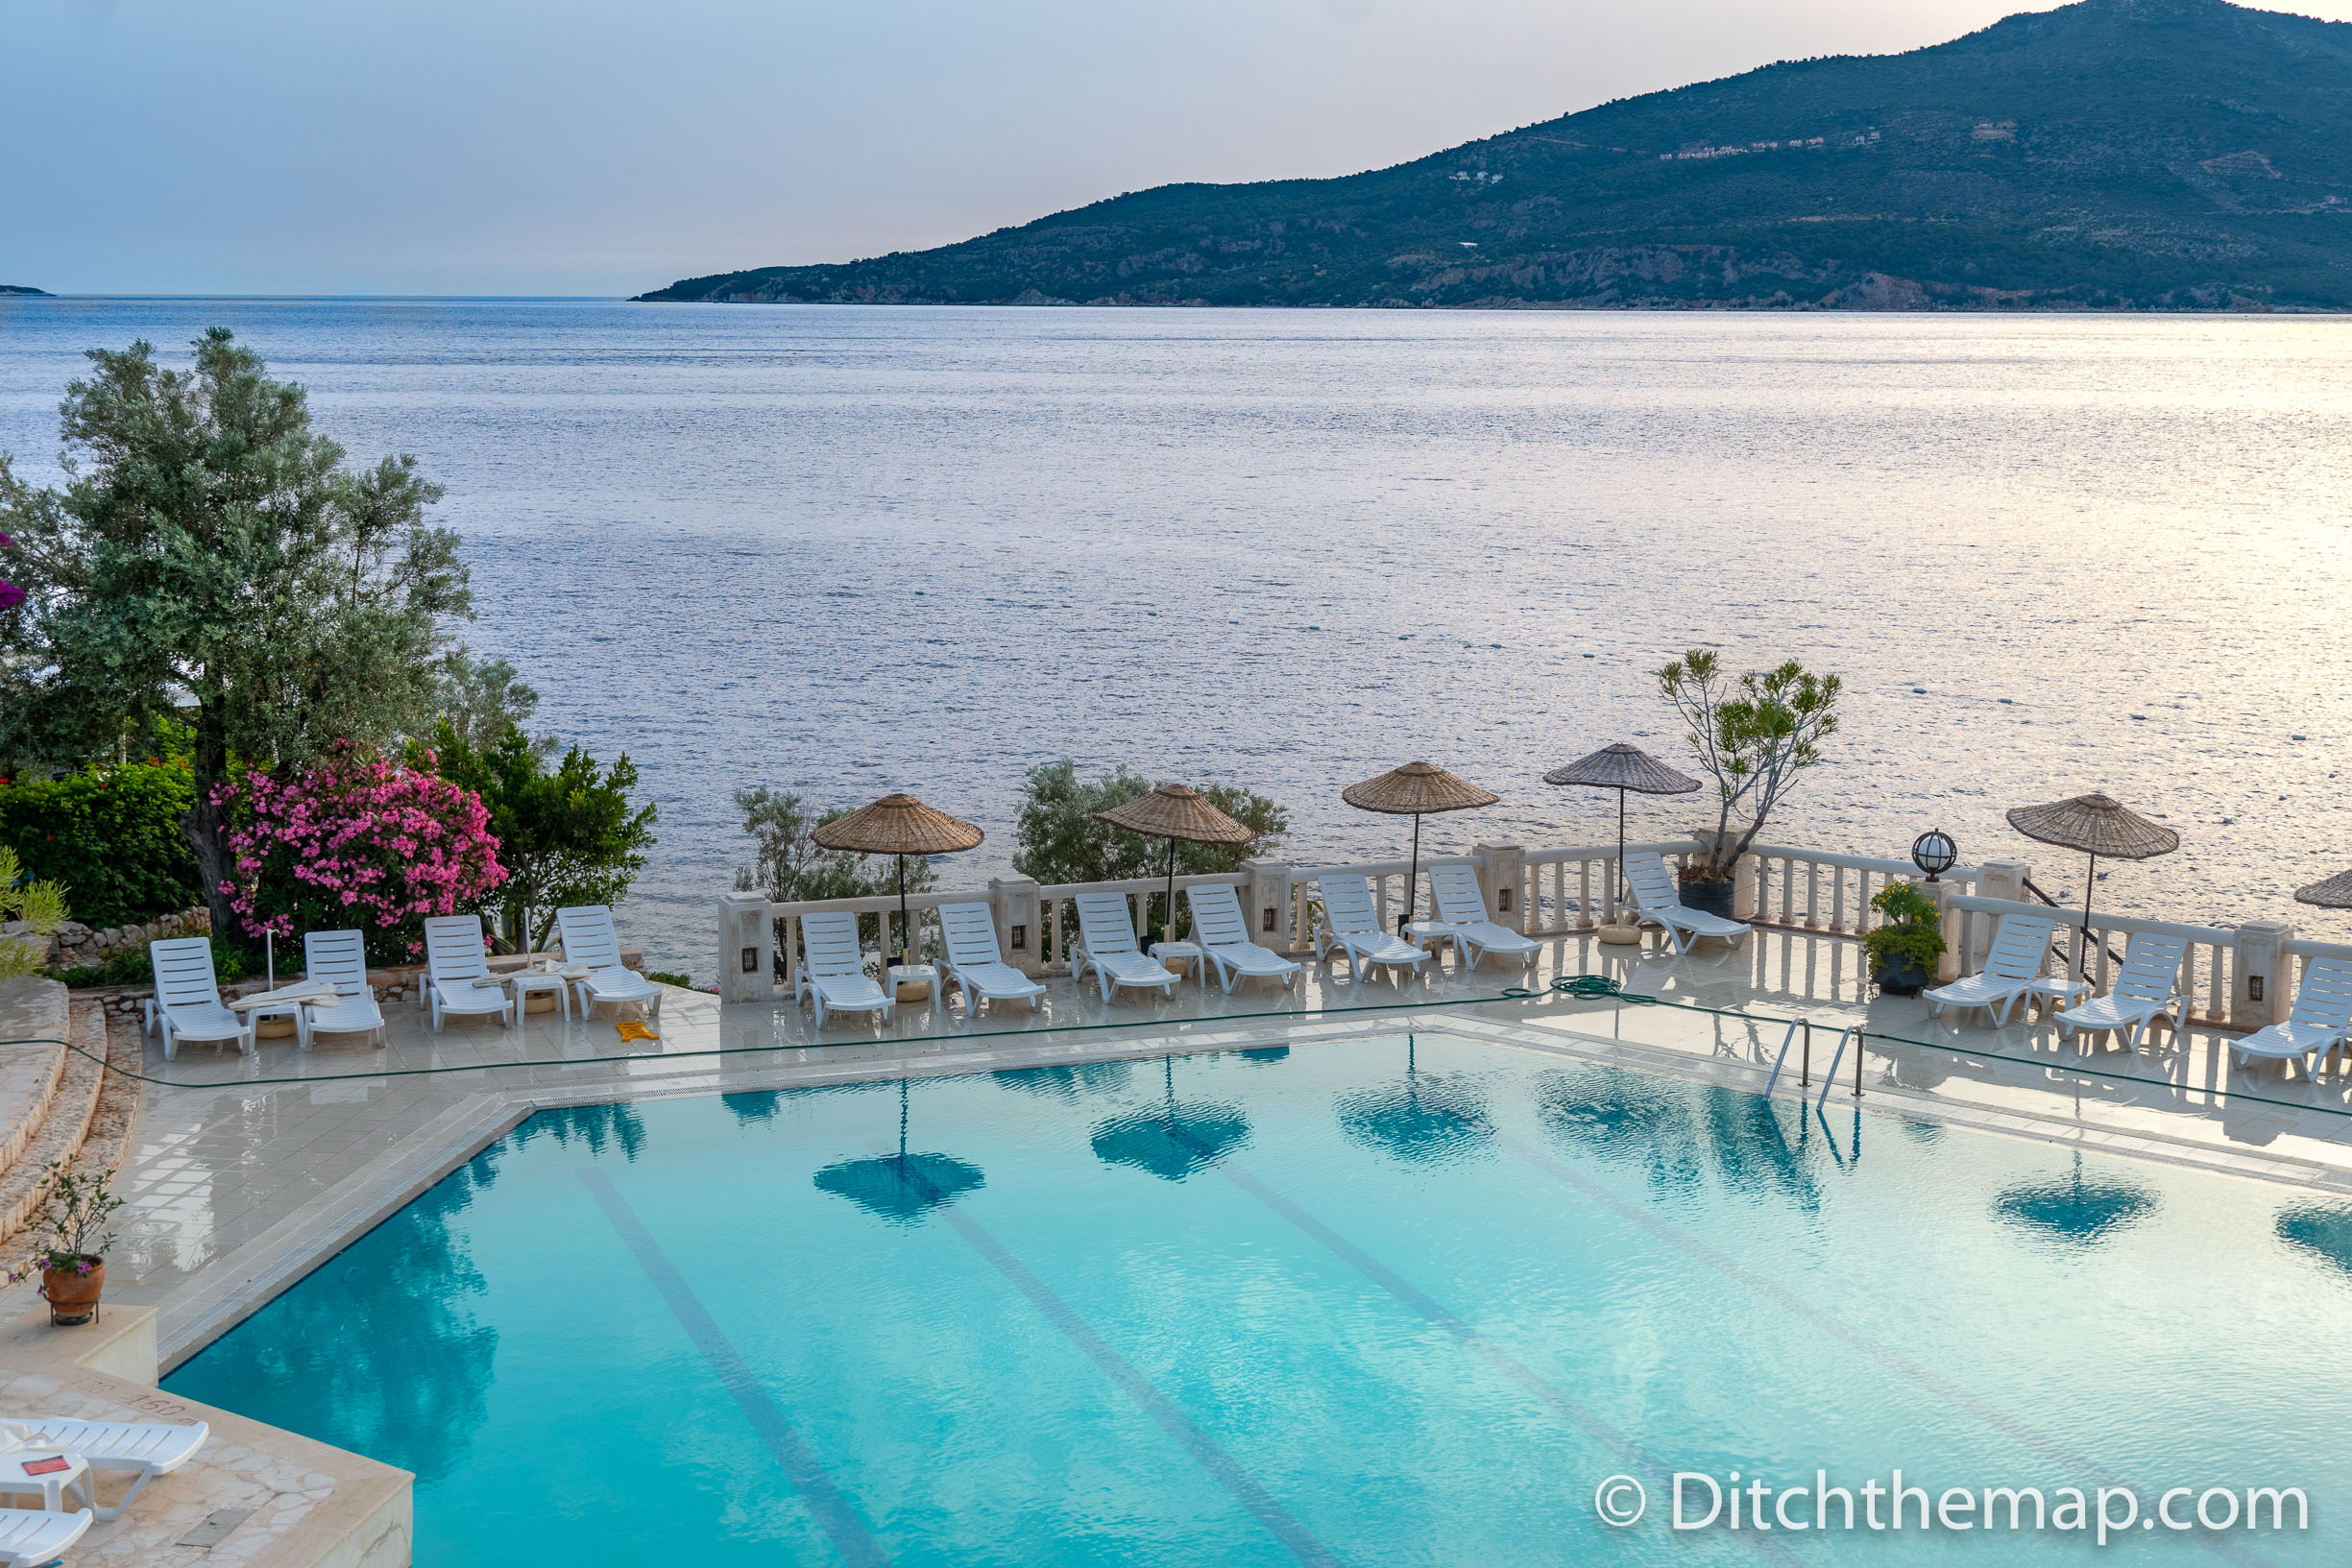 Pool at Our Resort in Kalkan, Turkey